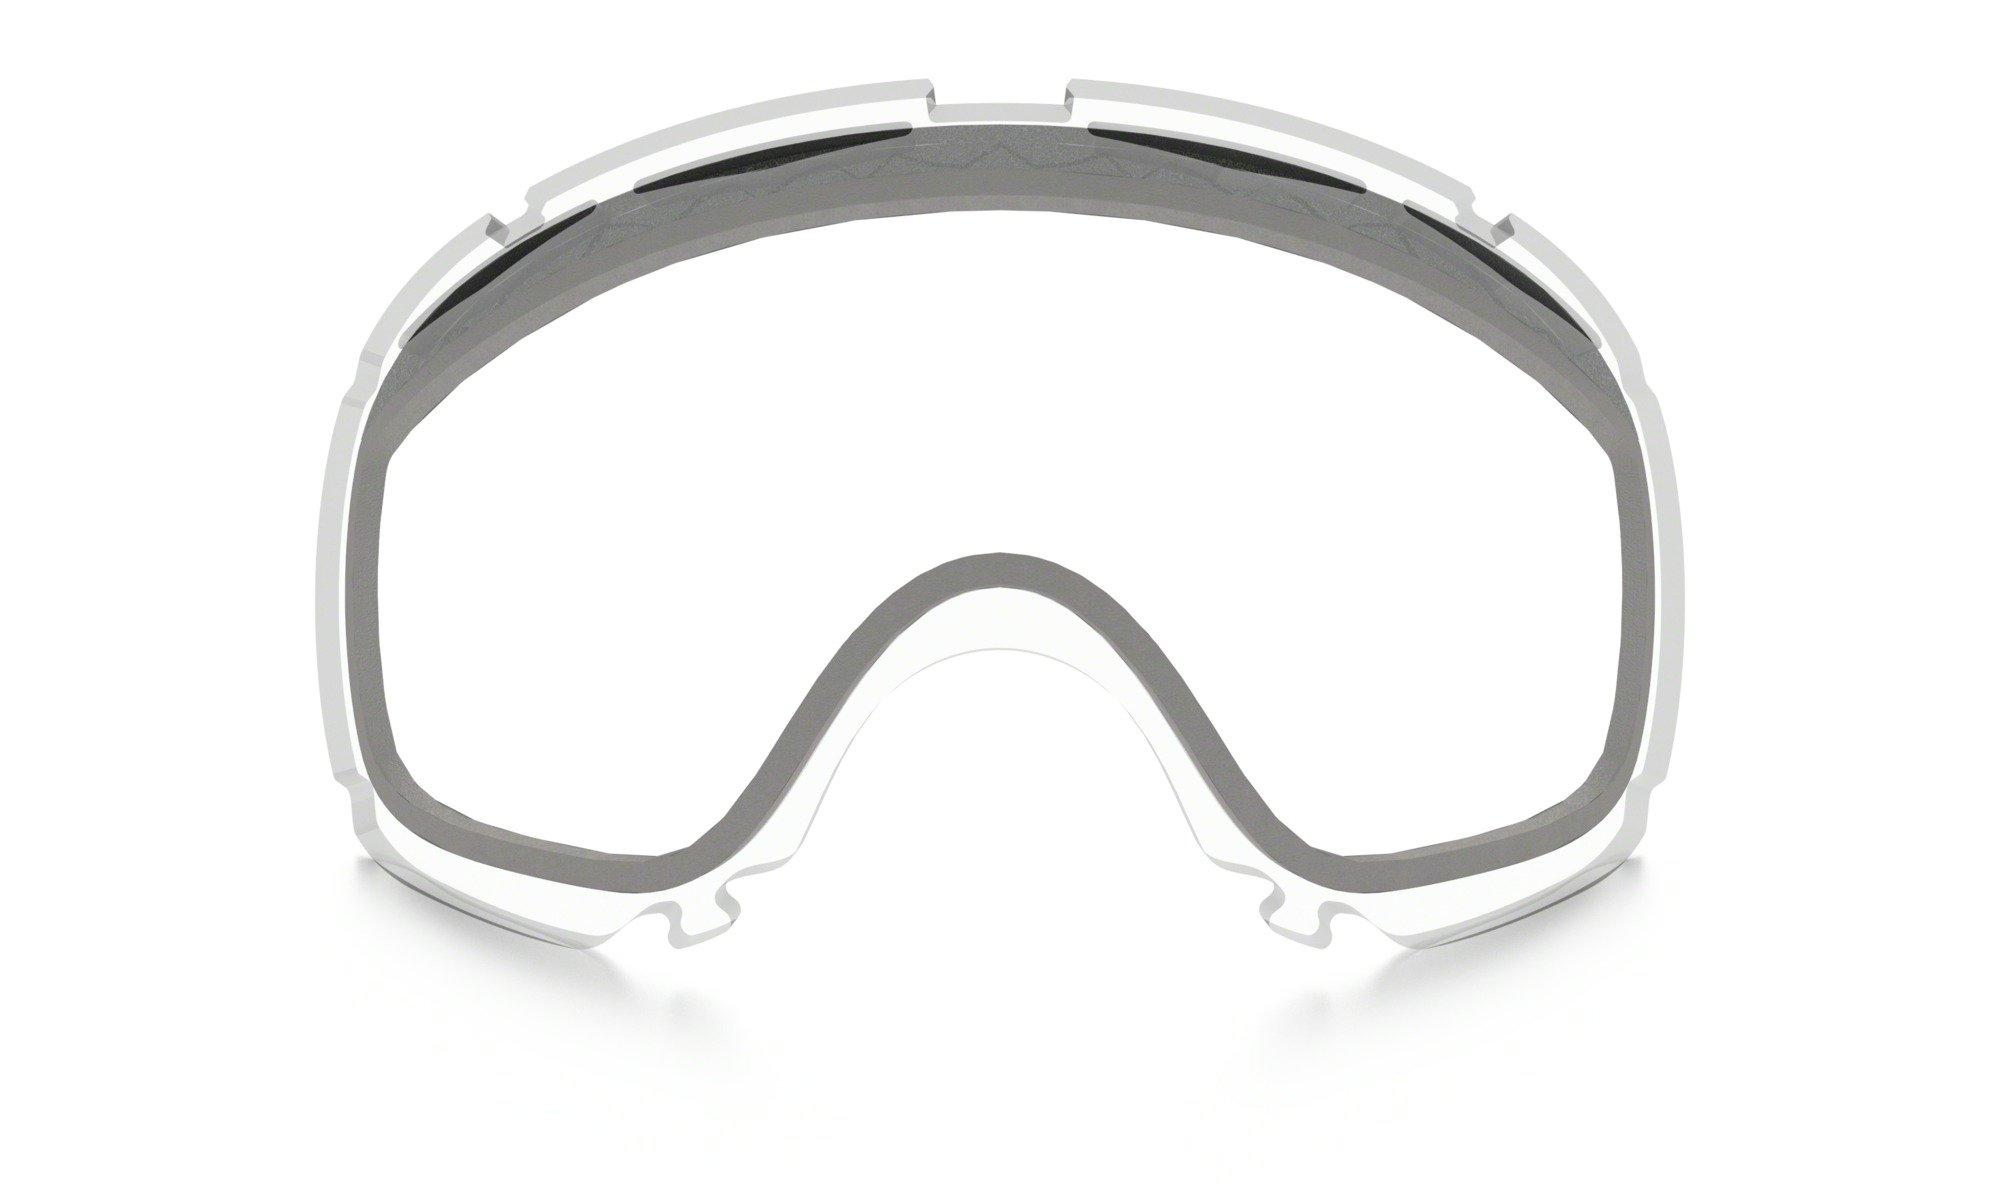 Oakley Goggle Lens Color Tint Guide Evo